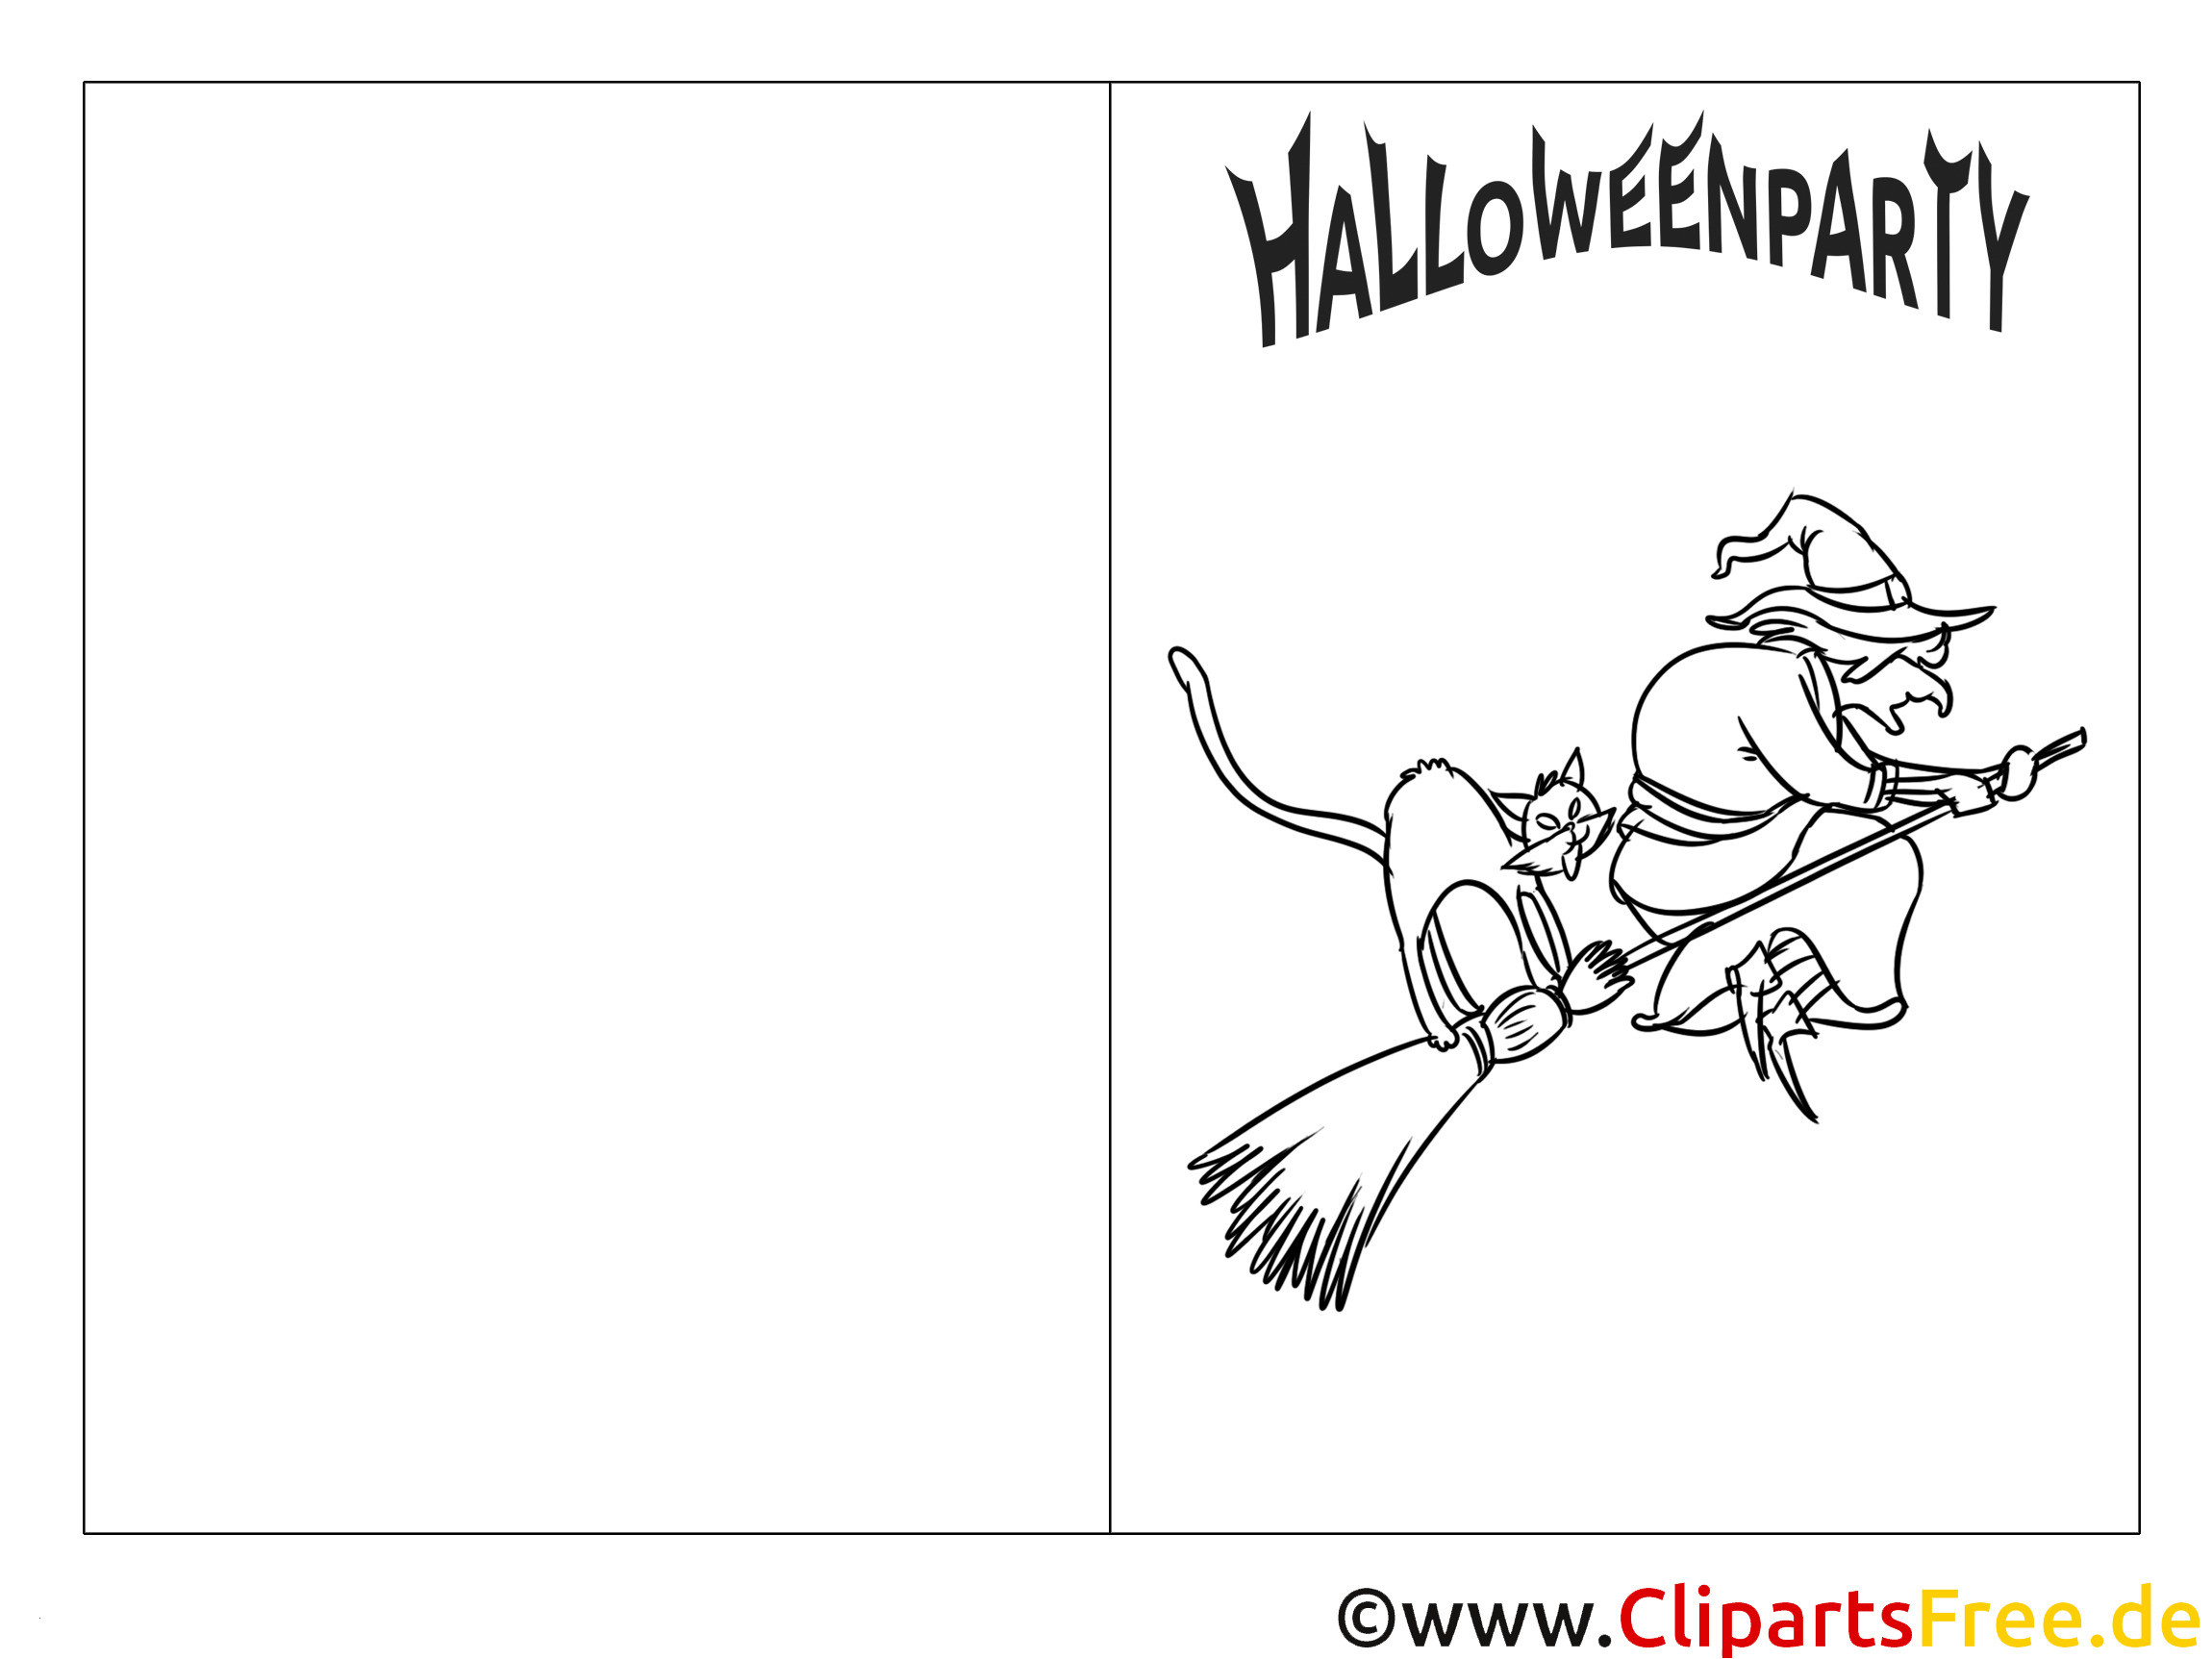 Coole Ausmalbilder Graffiti Neu Gruselige Hexe Auf Besen Bild Zum Ausmalen Genial Halloween Fotografieren